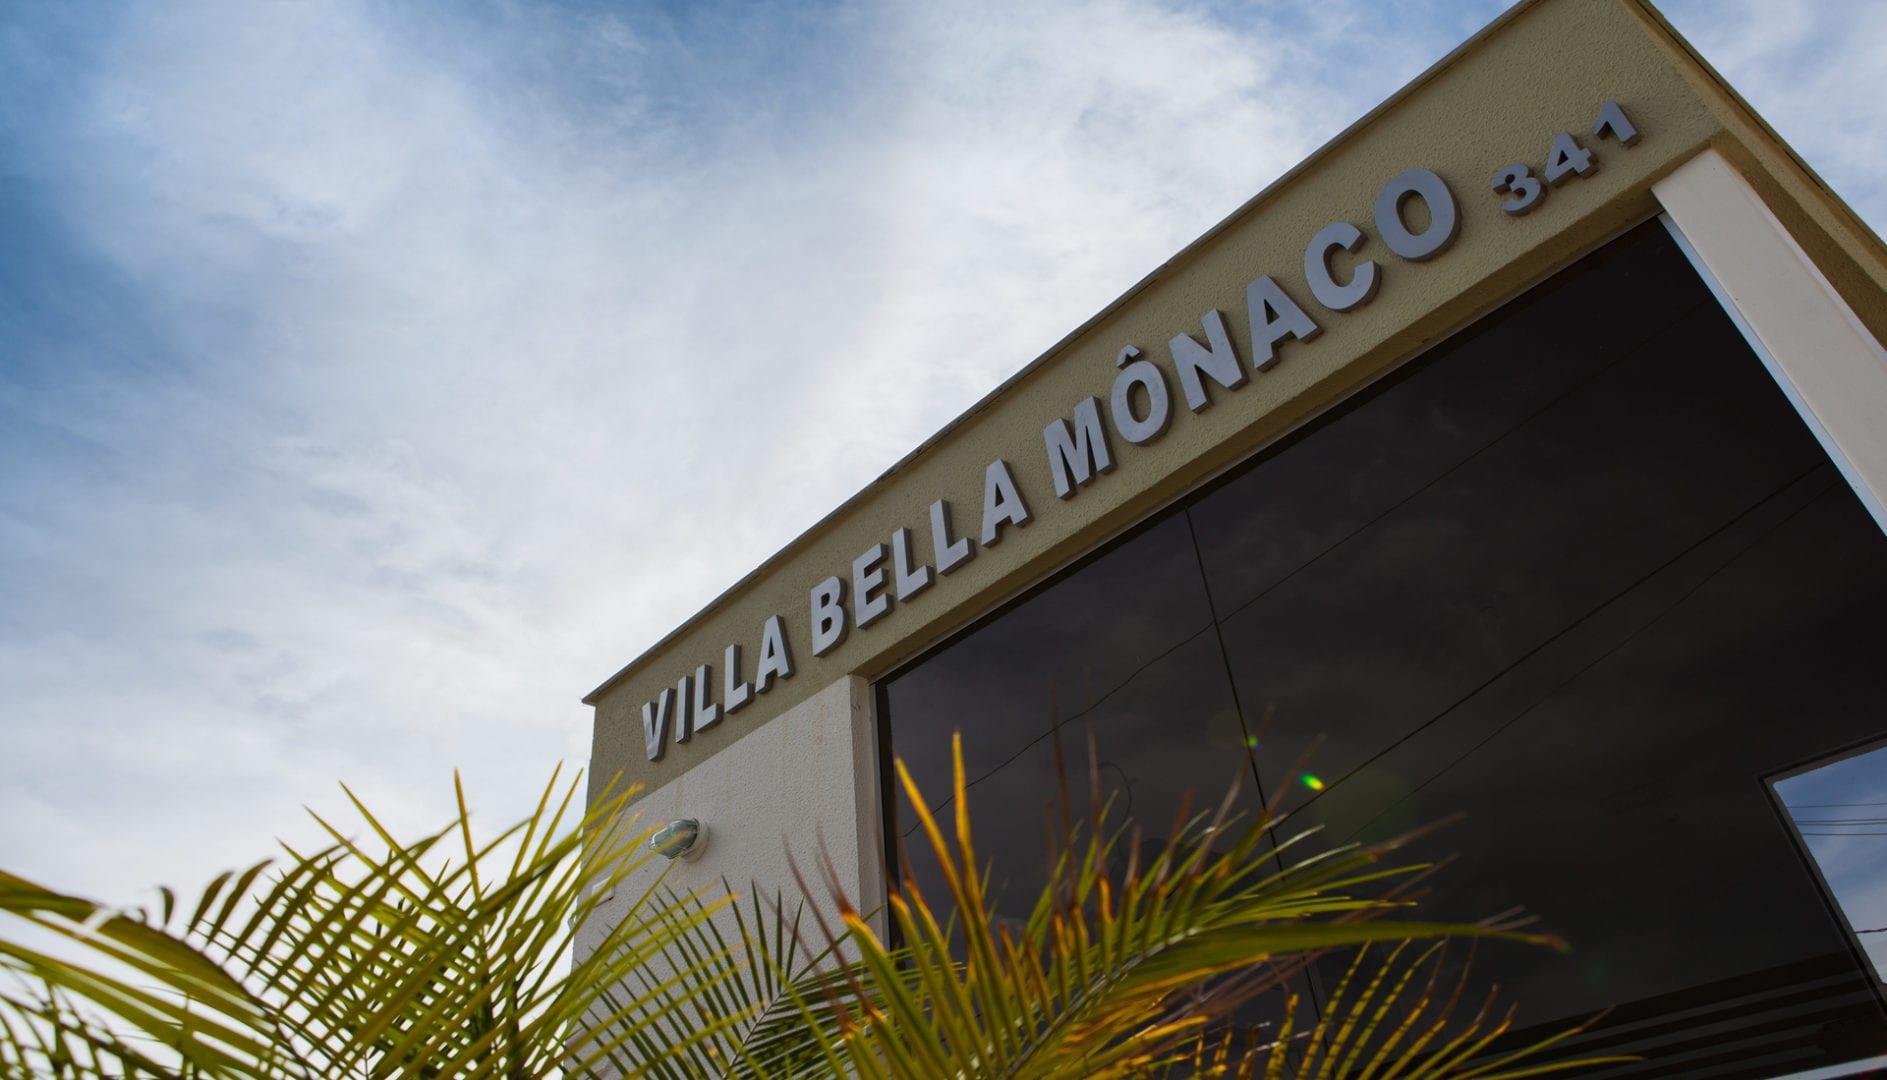 Villa Bella Mônaco - Villa Bella Monaco_300dpi217-Edit